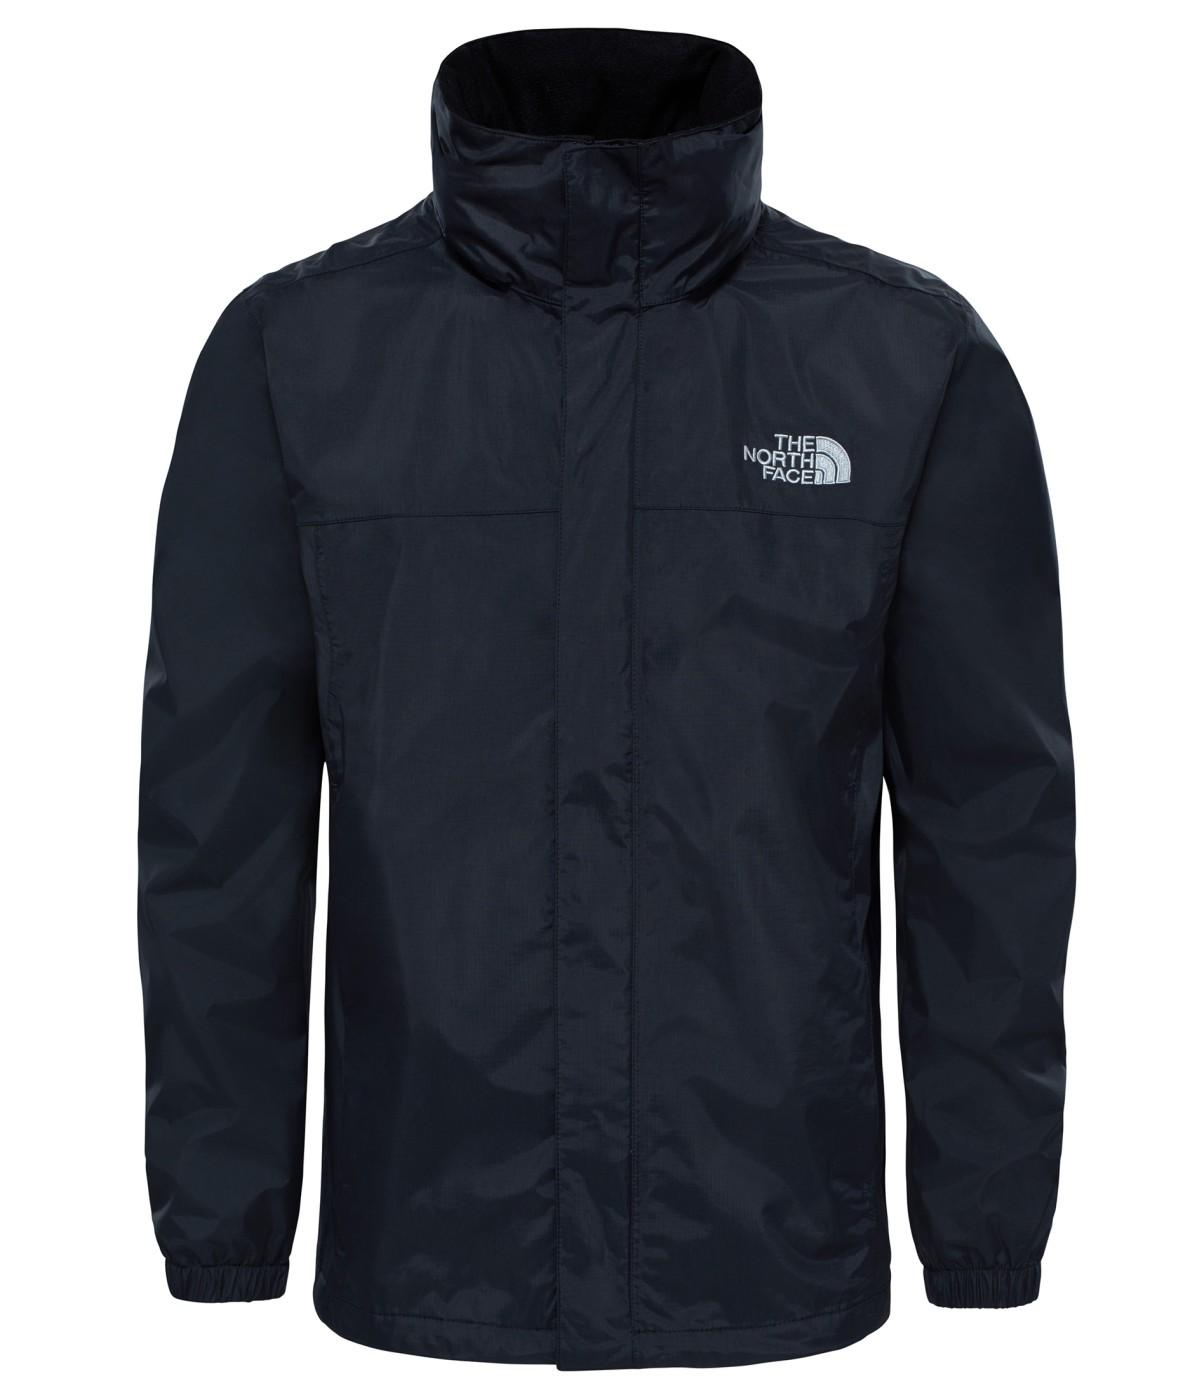 The North Face Men's Resolve Jacket M TNF BLACK/TNF BLACK-30